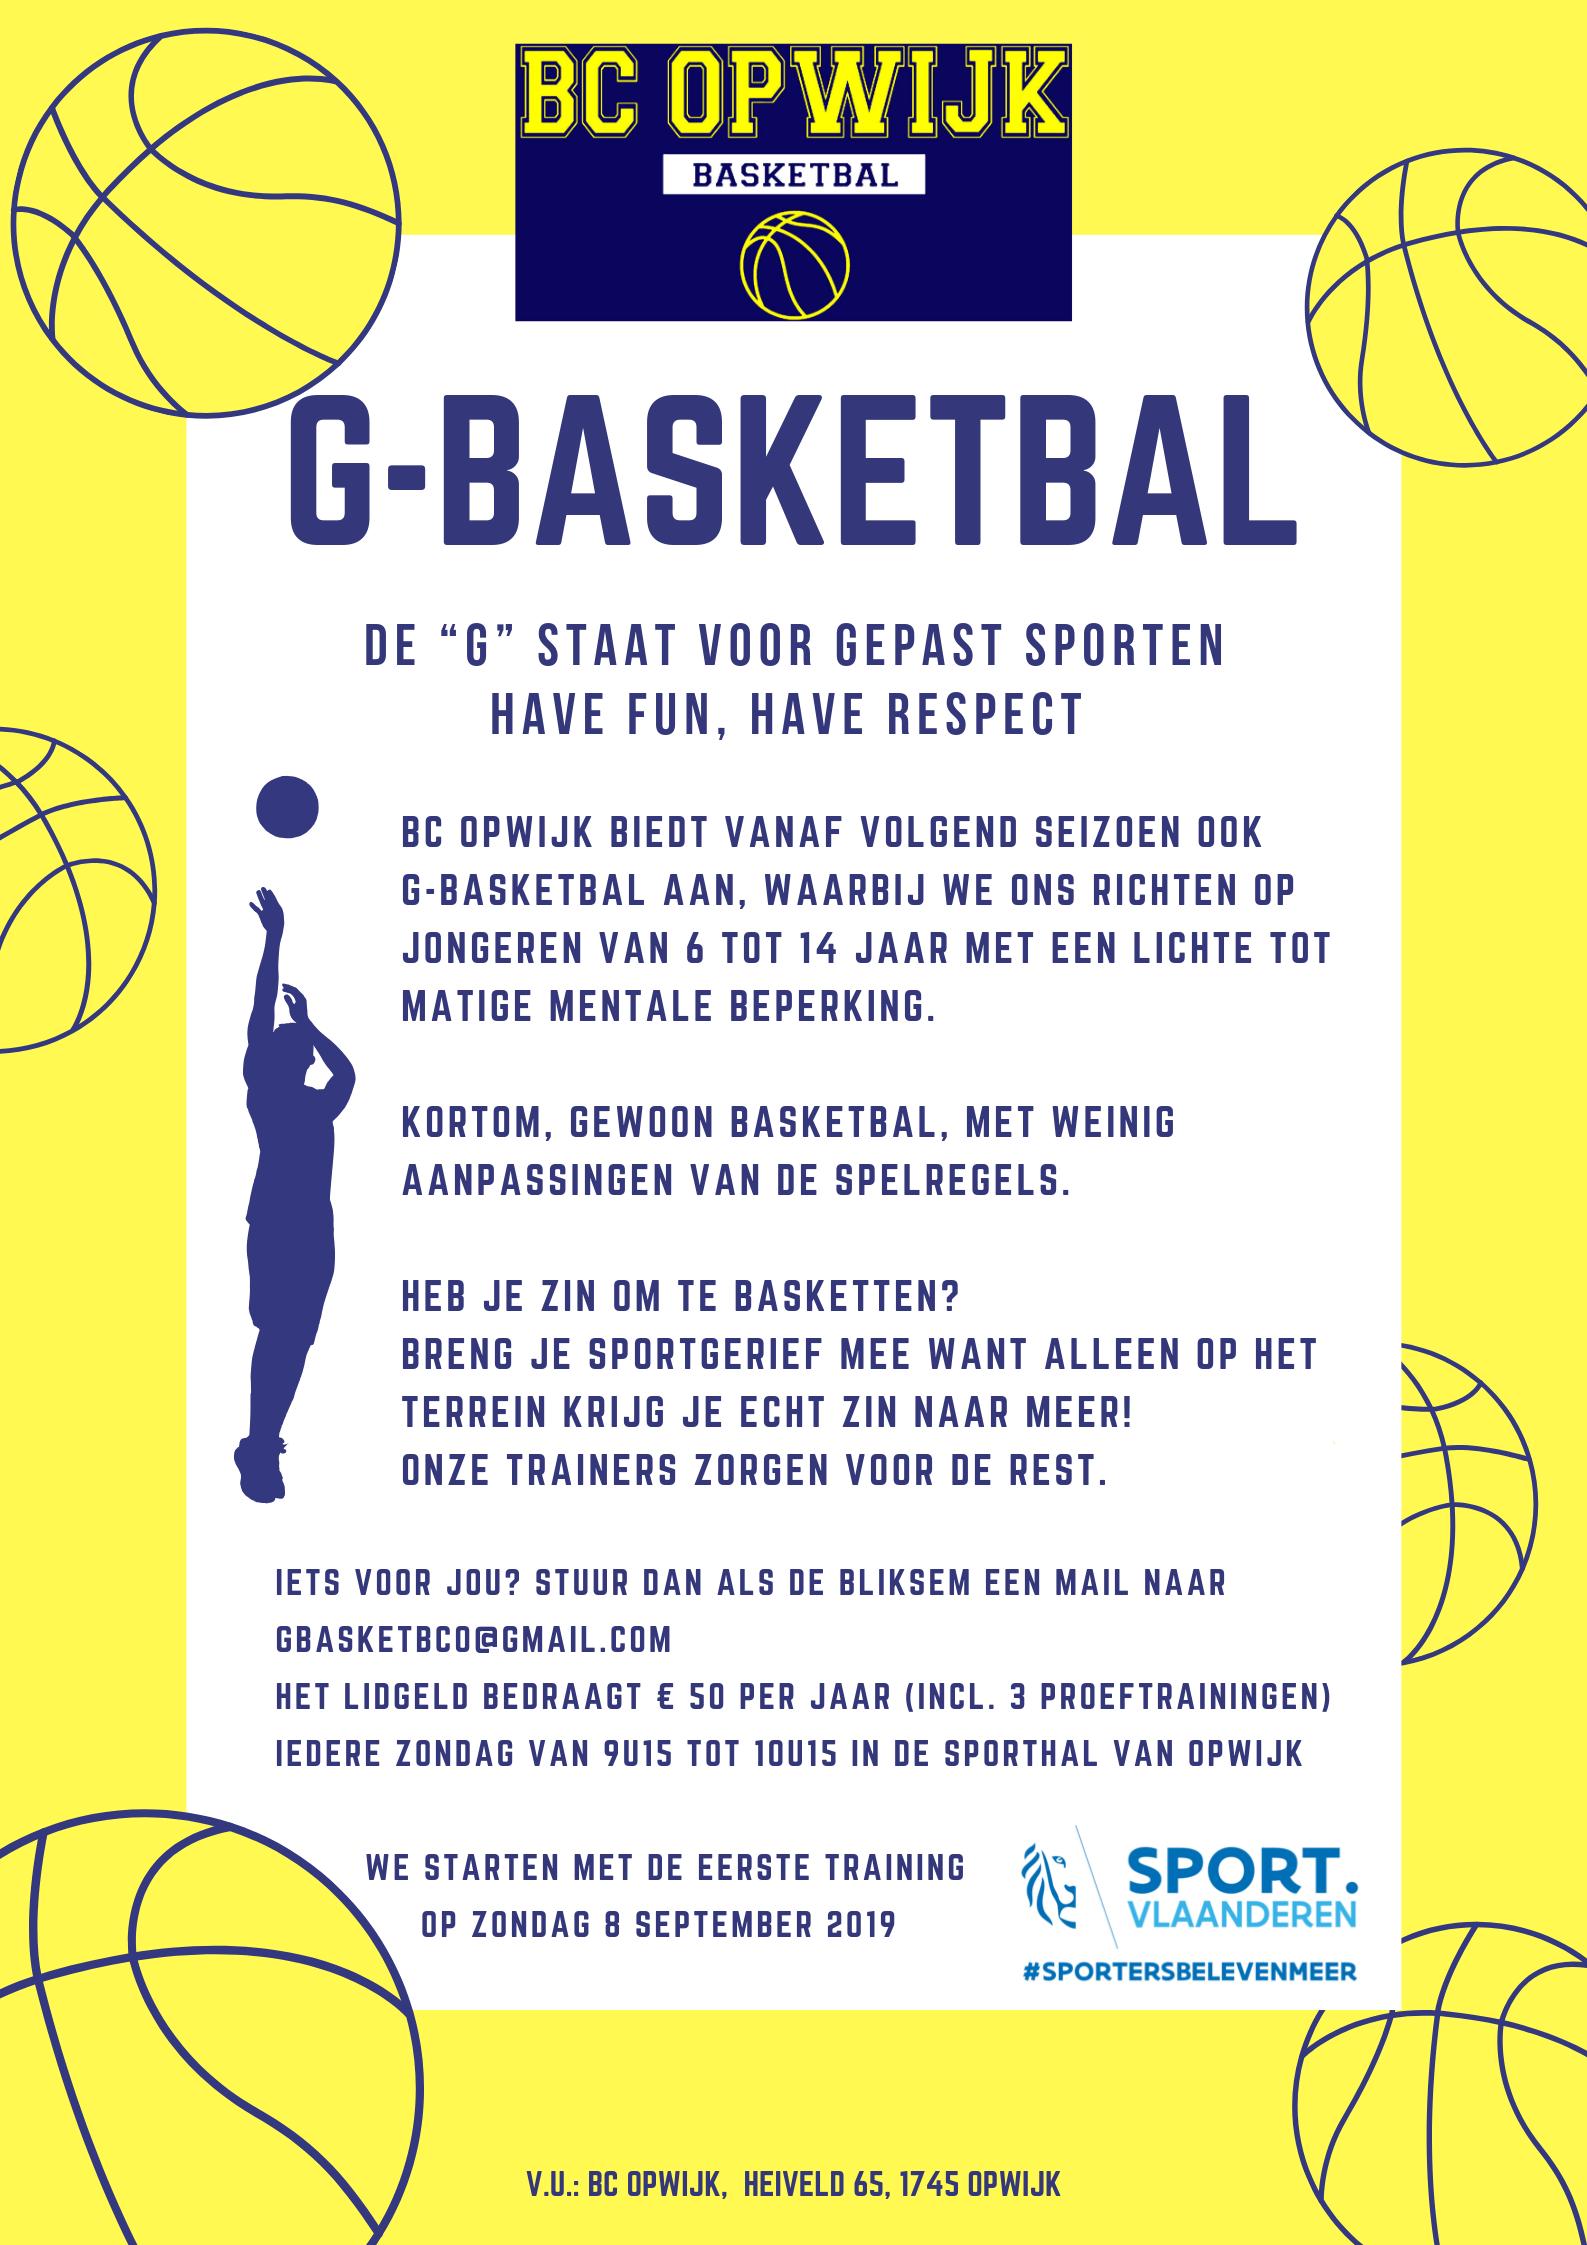 G-Basketbal